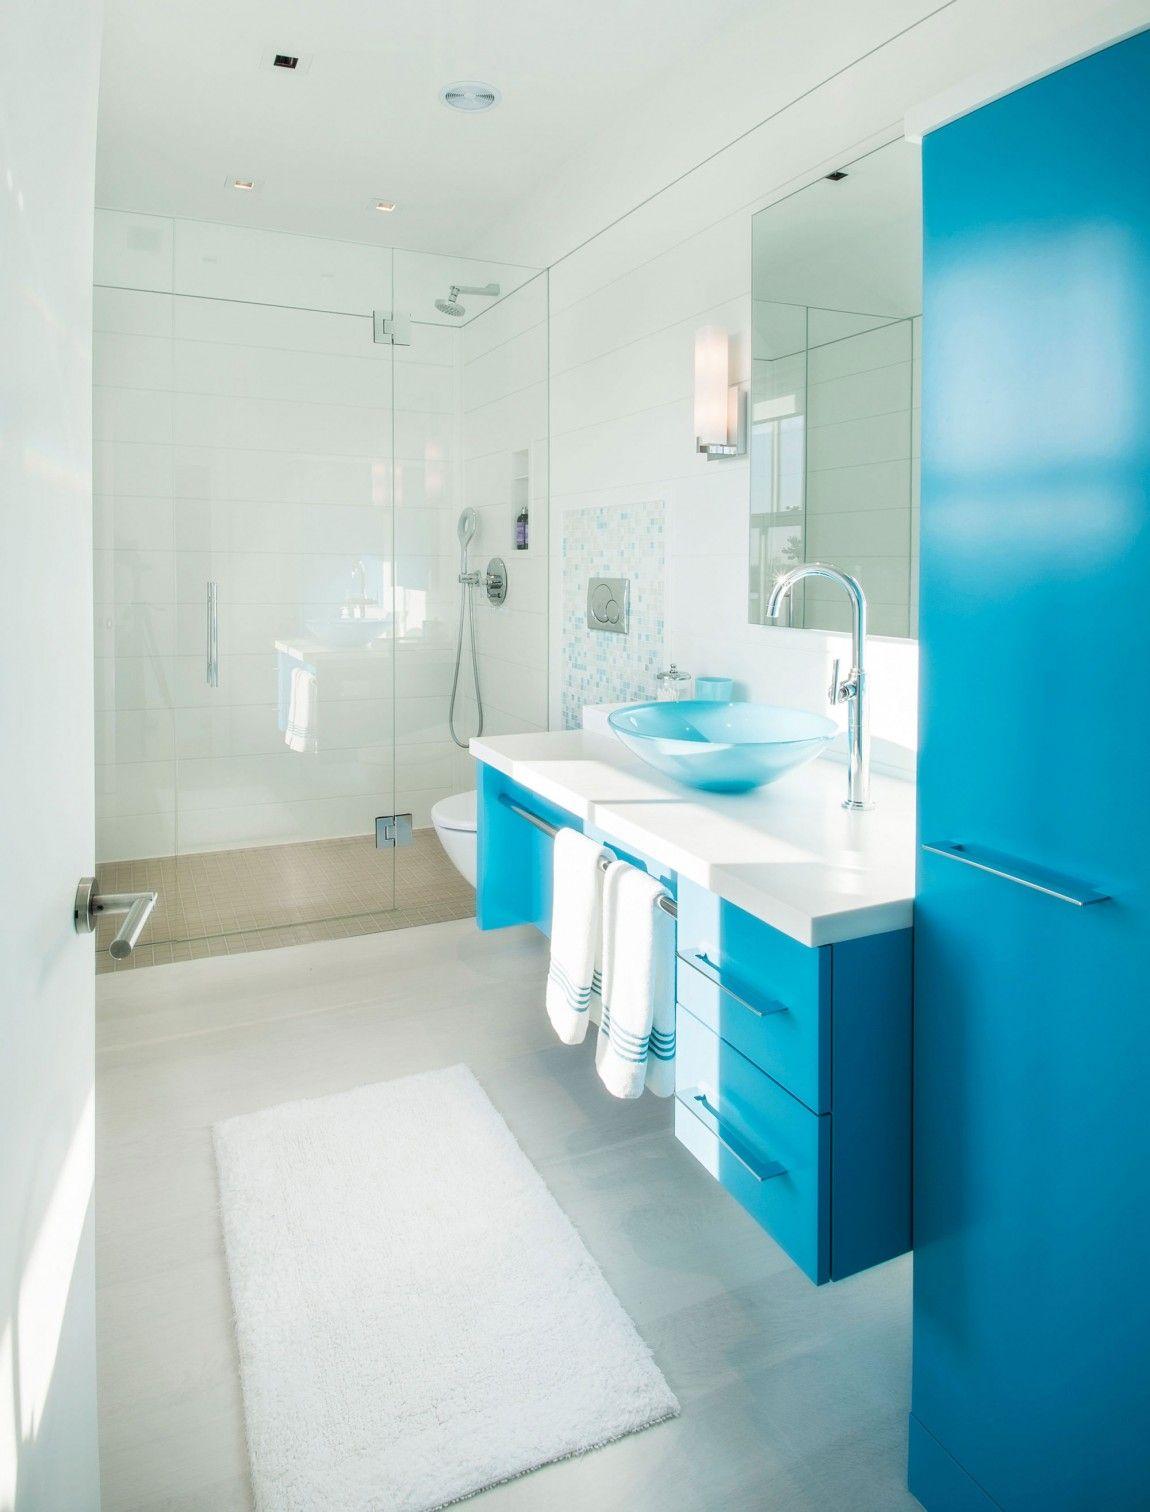 Bright blue in the bathroom   Bathrooms   Pinterest   Nantucket ...